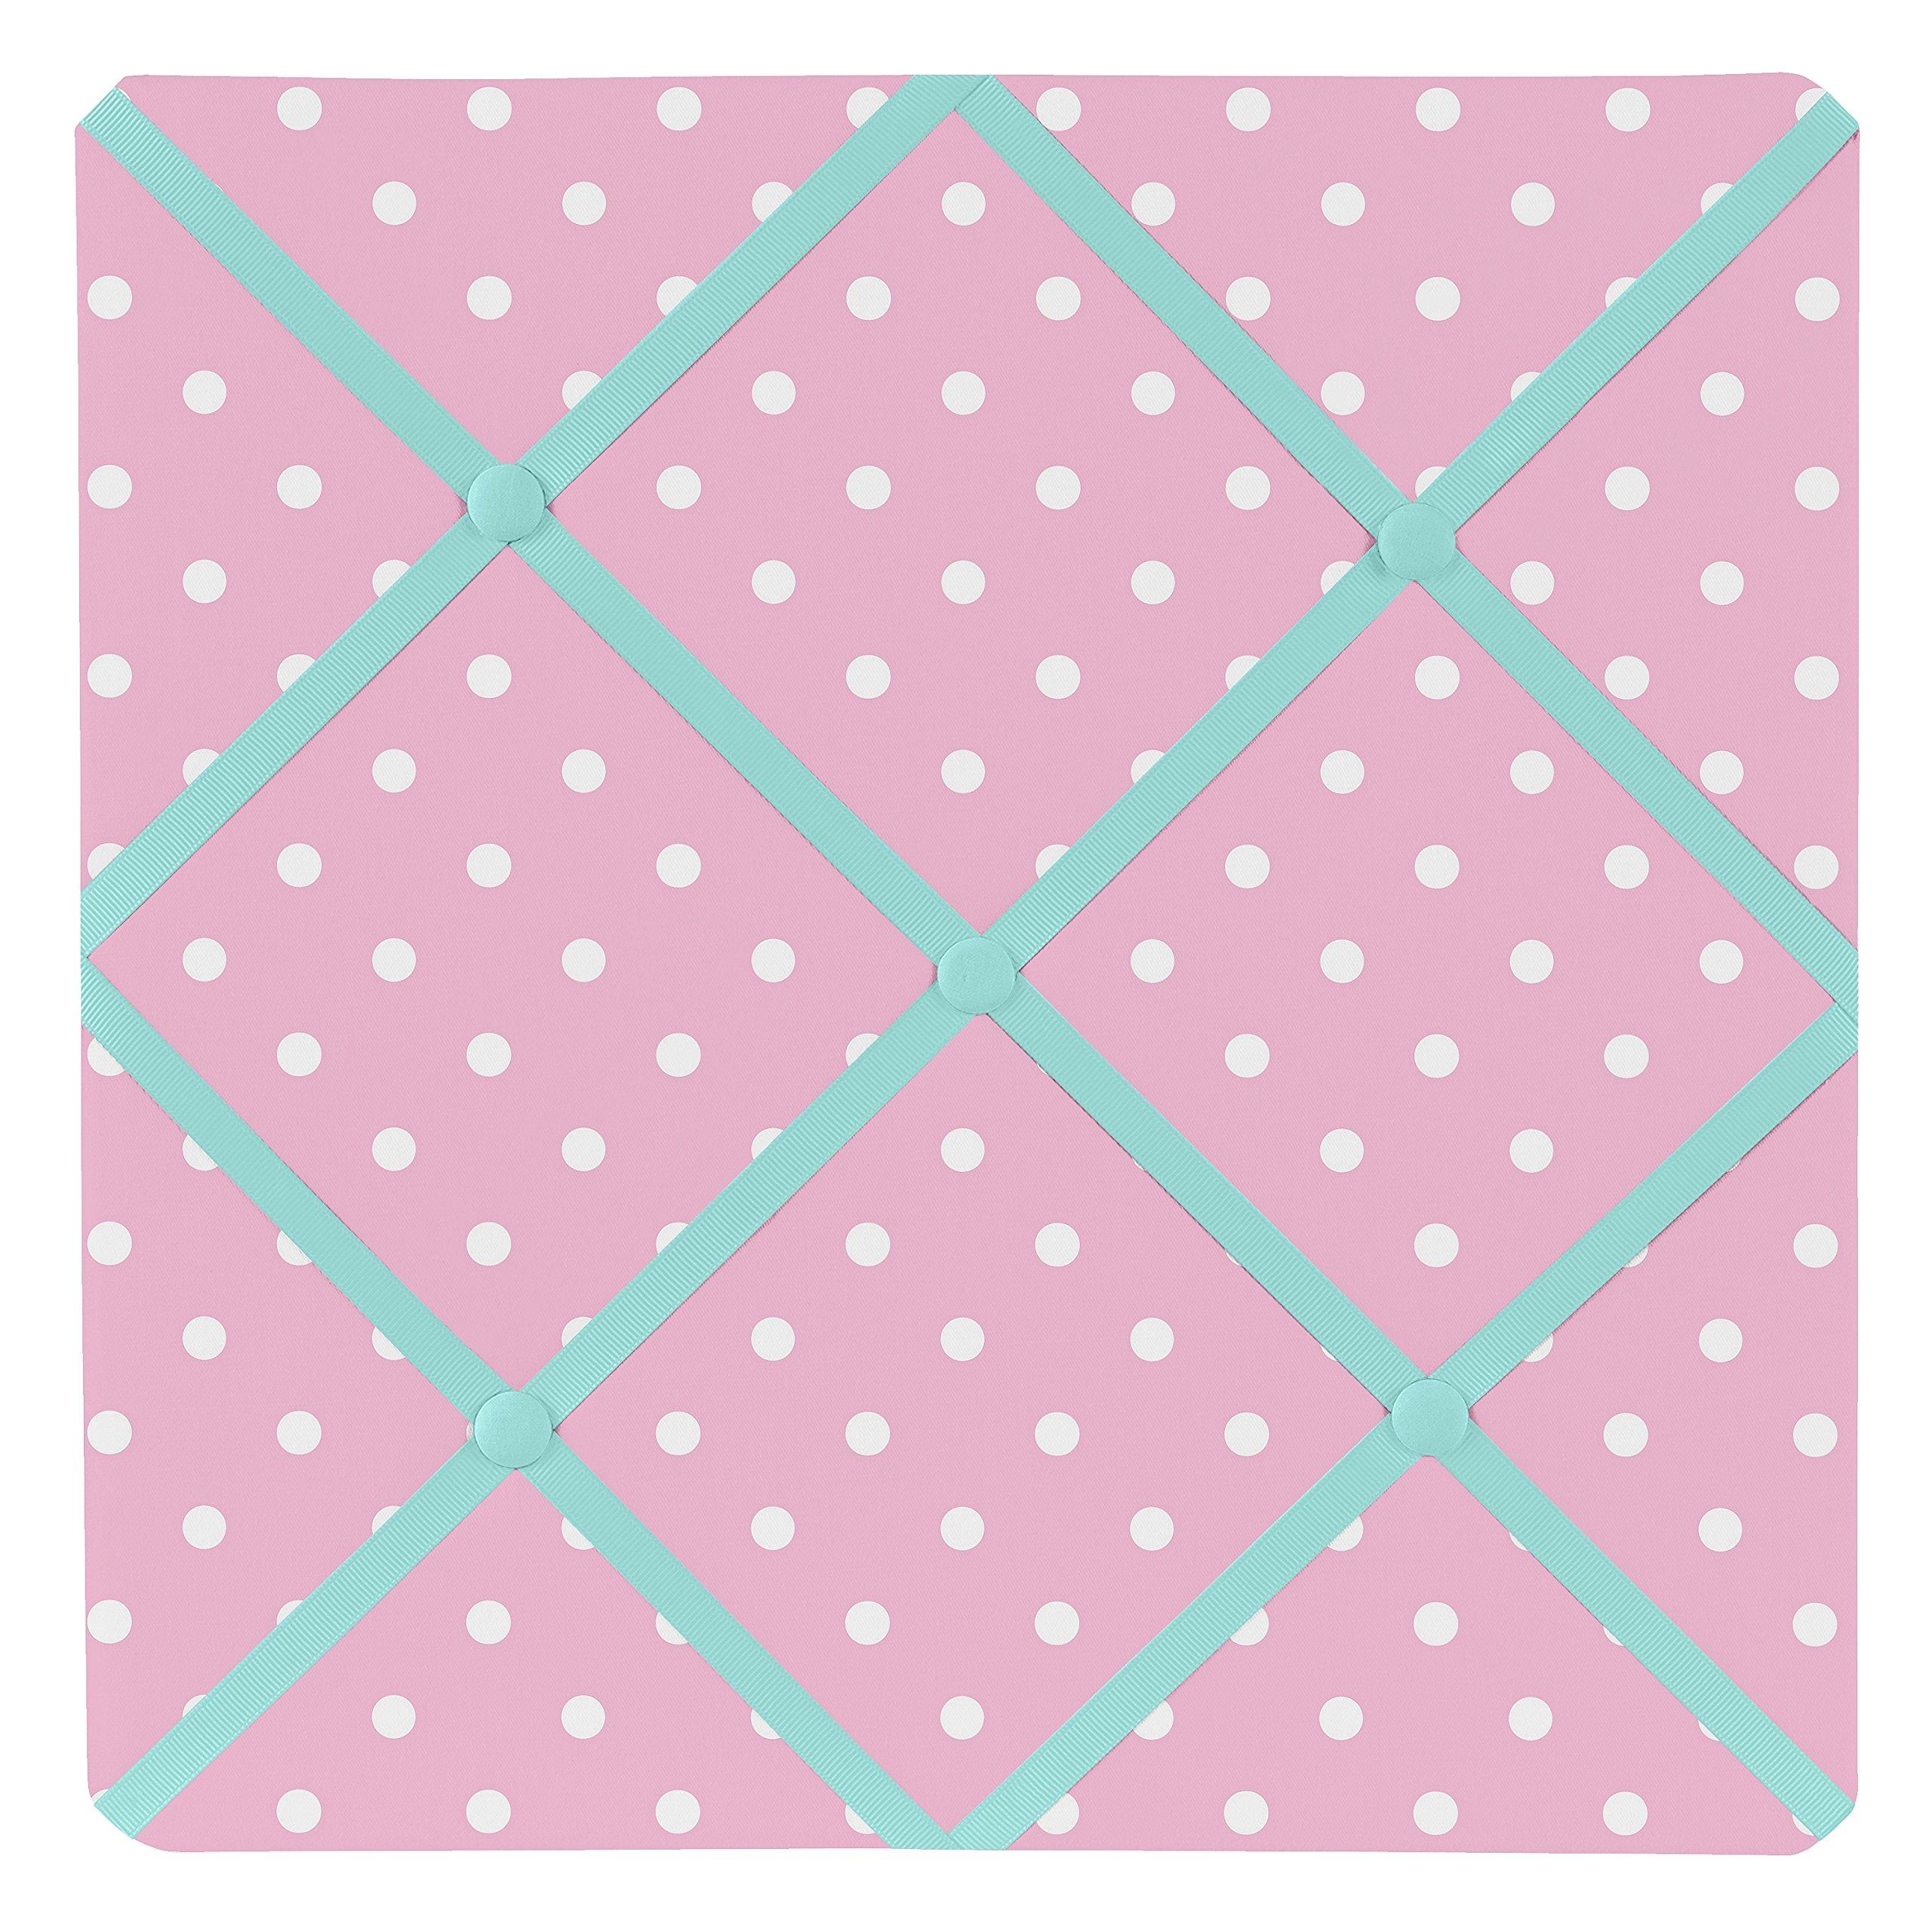 Sweet Jojo Designs Pink Polka Dot and Turquoise Skylar Fabric Memory/Memo Photo Bulletin Board by Sweet Jojo Designs